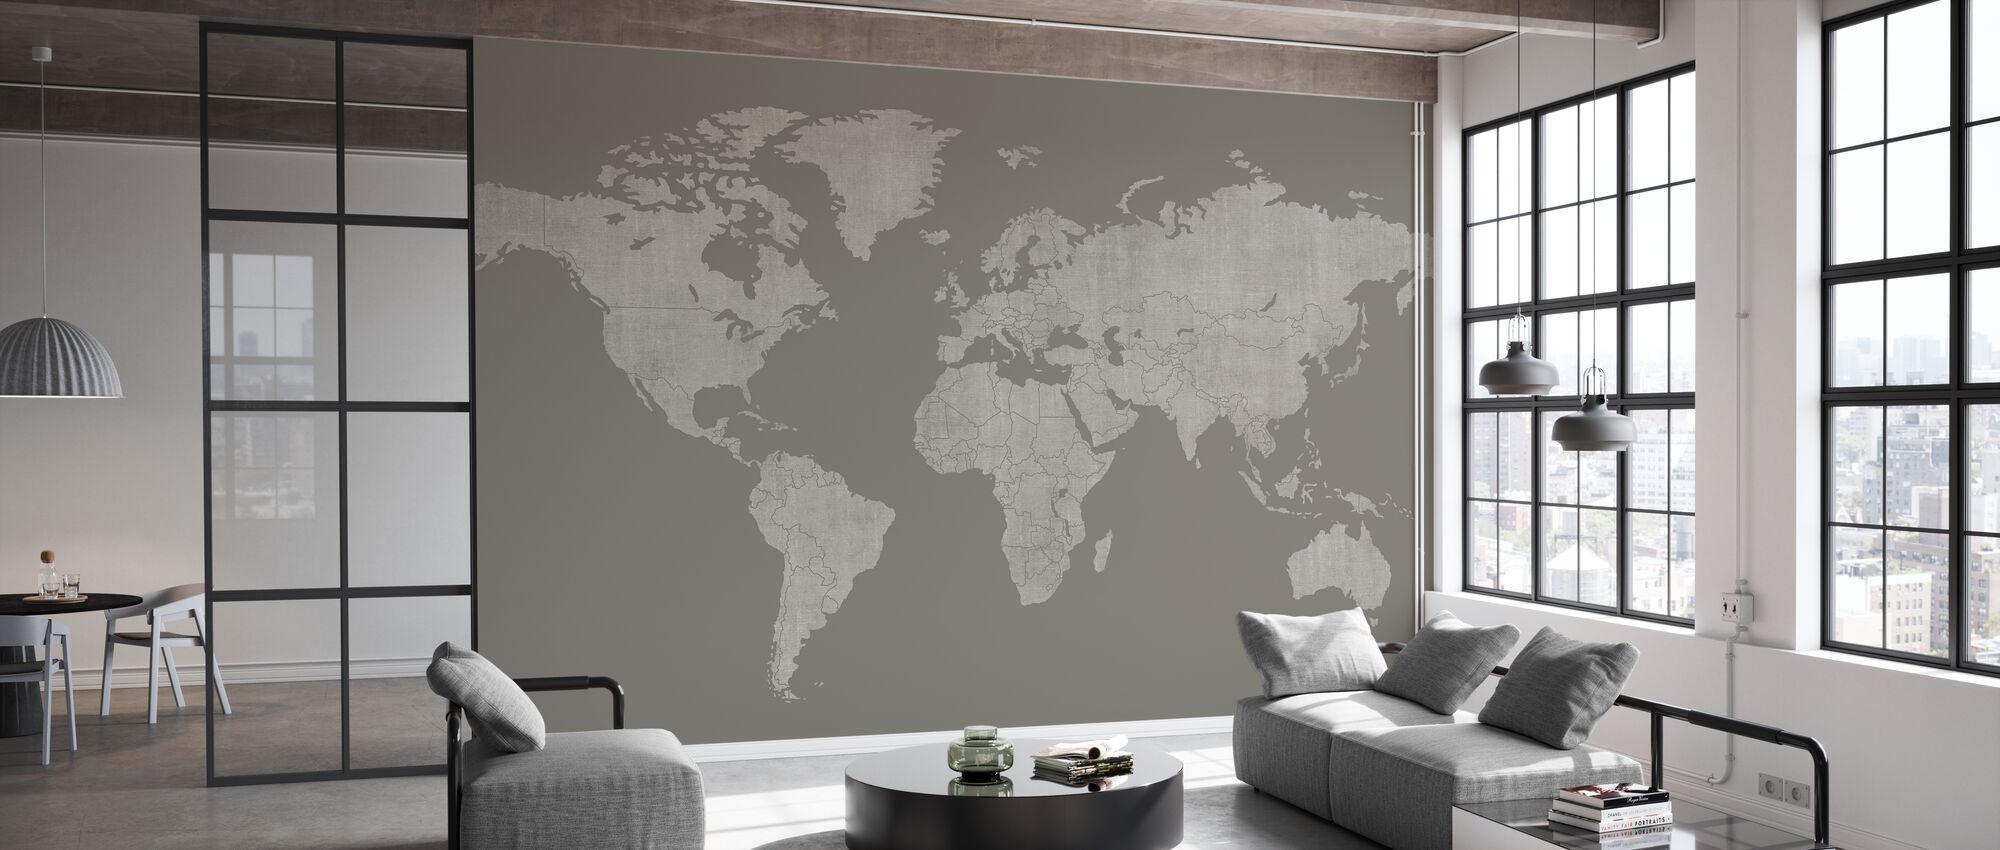 Voguish Weltkarte - Braun Grau - Tapete - Büro